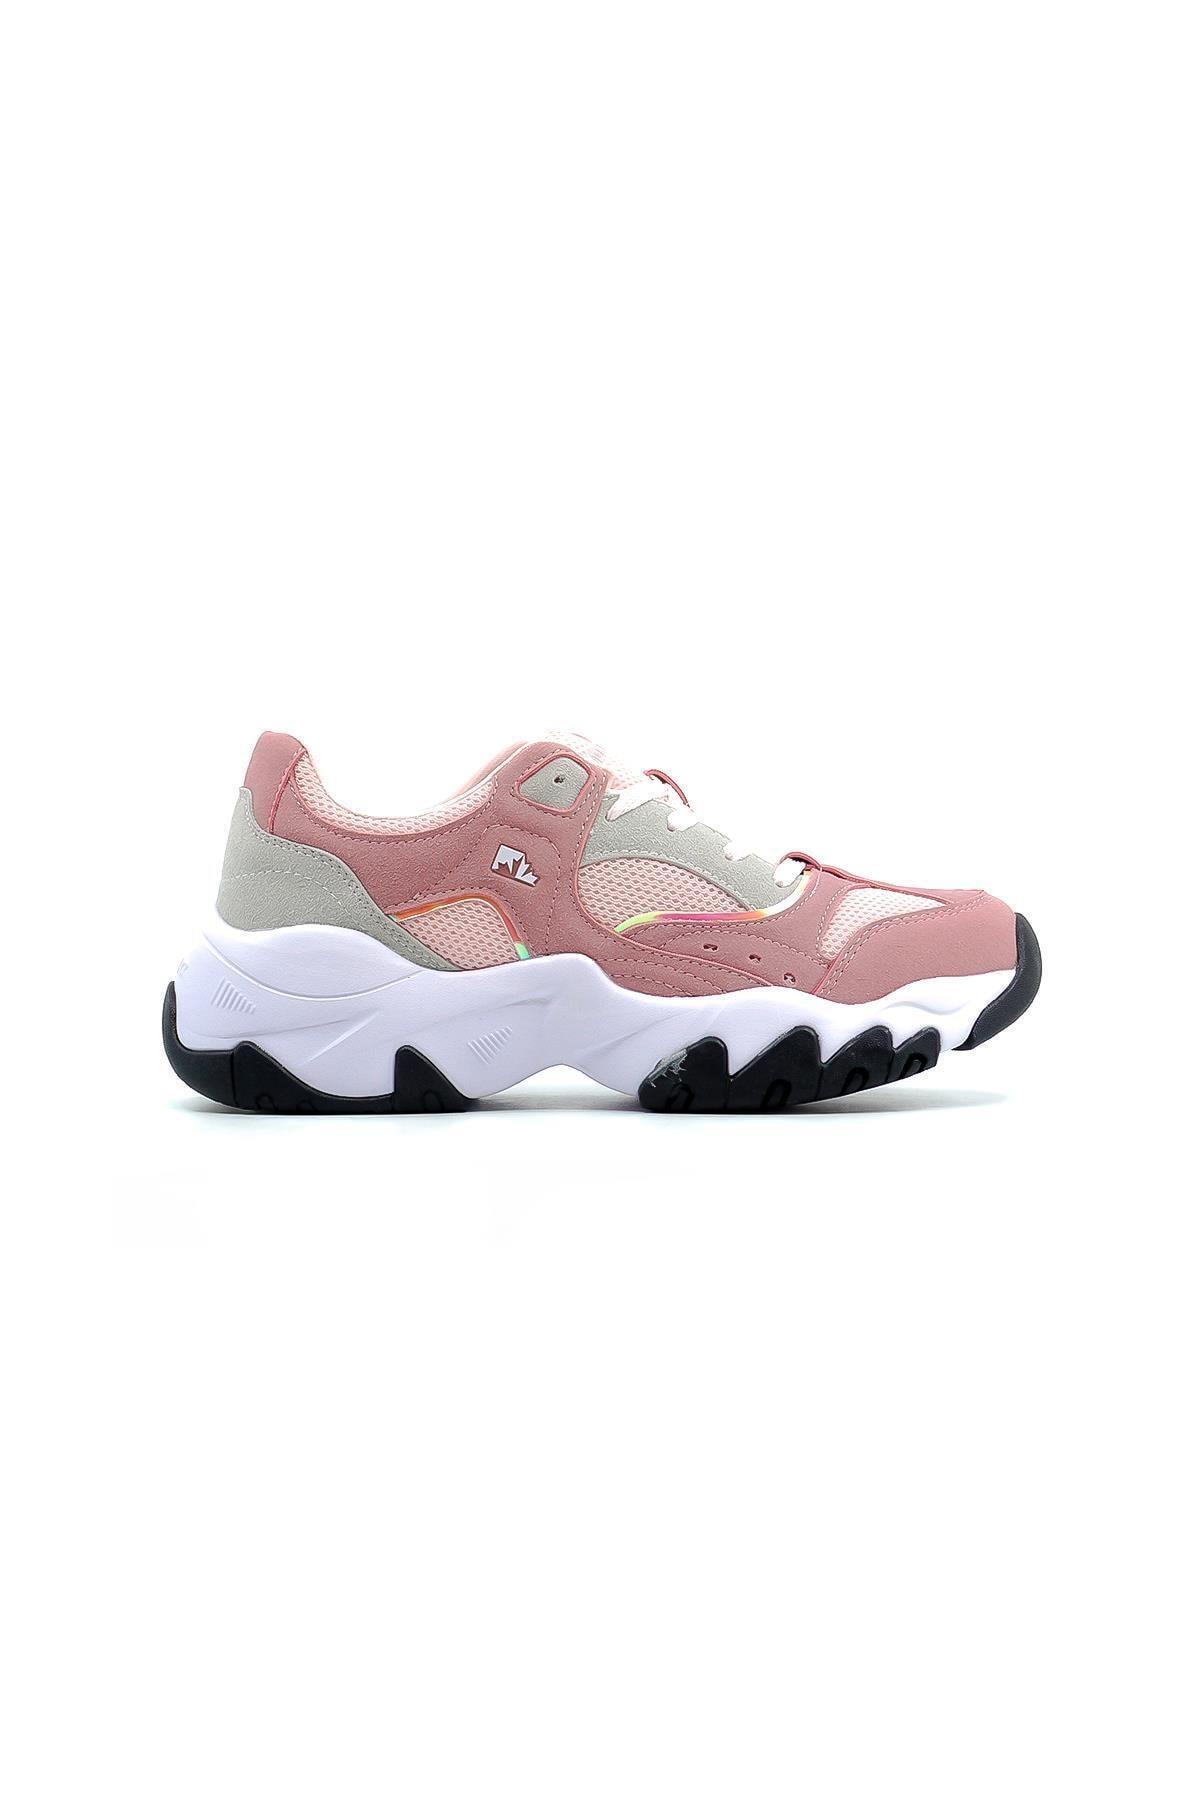 lumberjack Kadın Pembe Pudra Regına Sneaker Ayakkabı 1